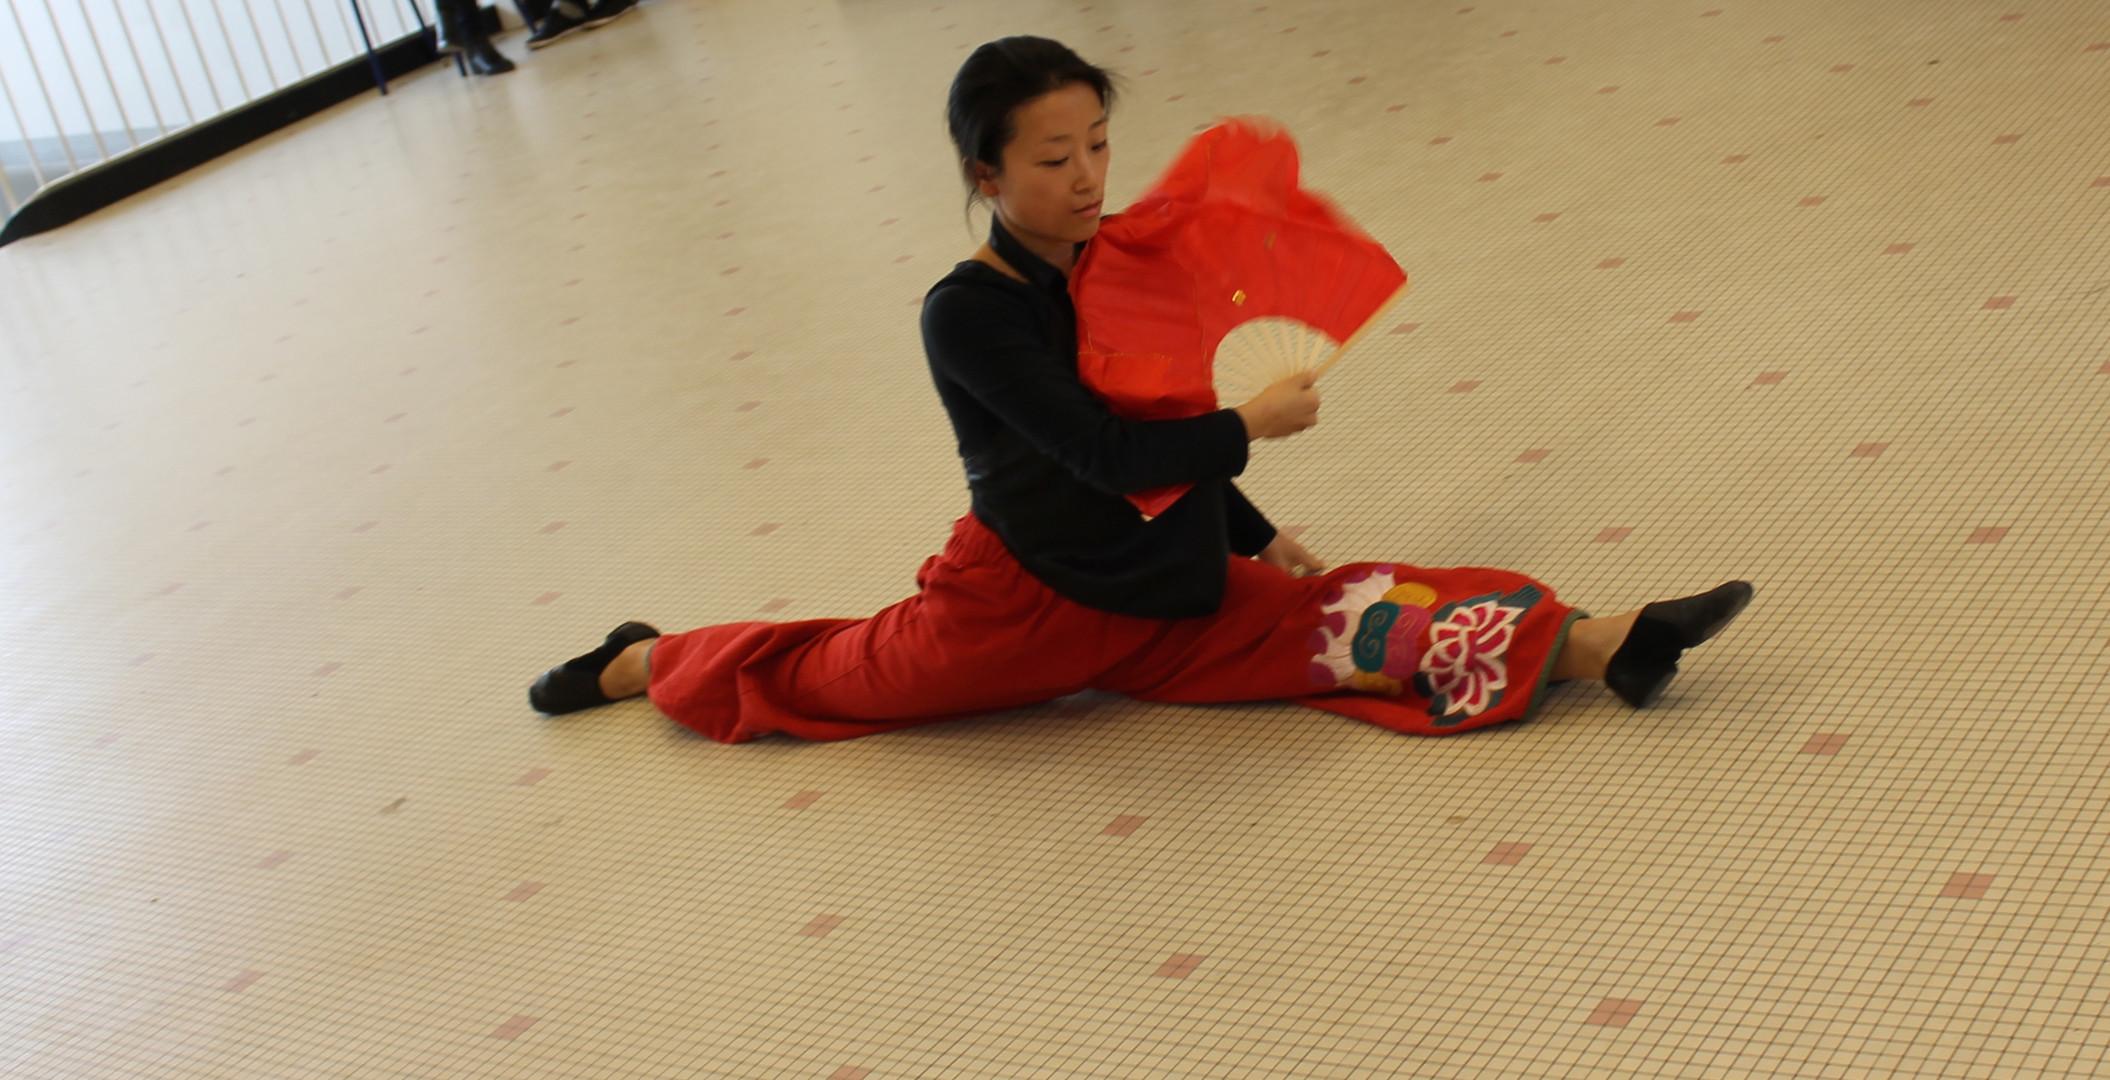 Danse Nouvel an chinois   LIV CHANG - peinture et danse